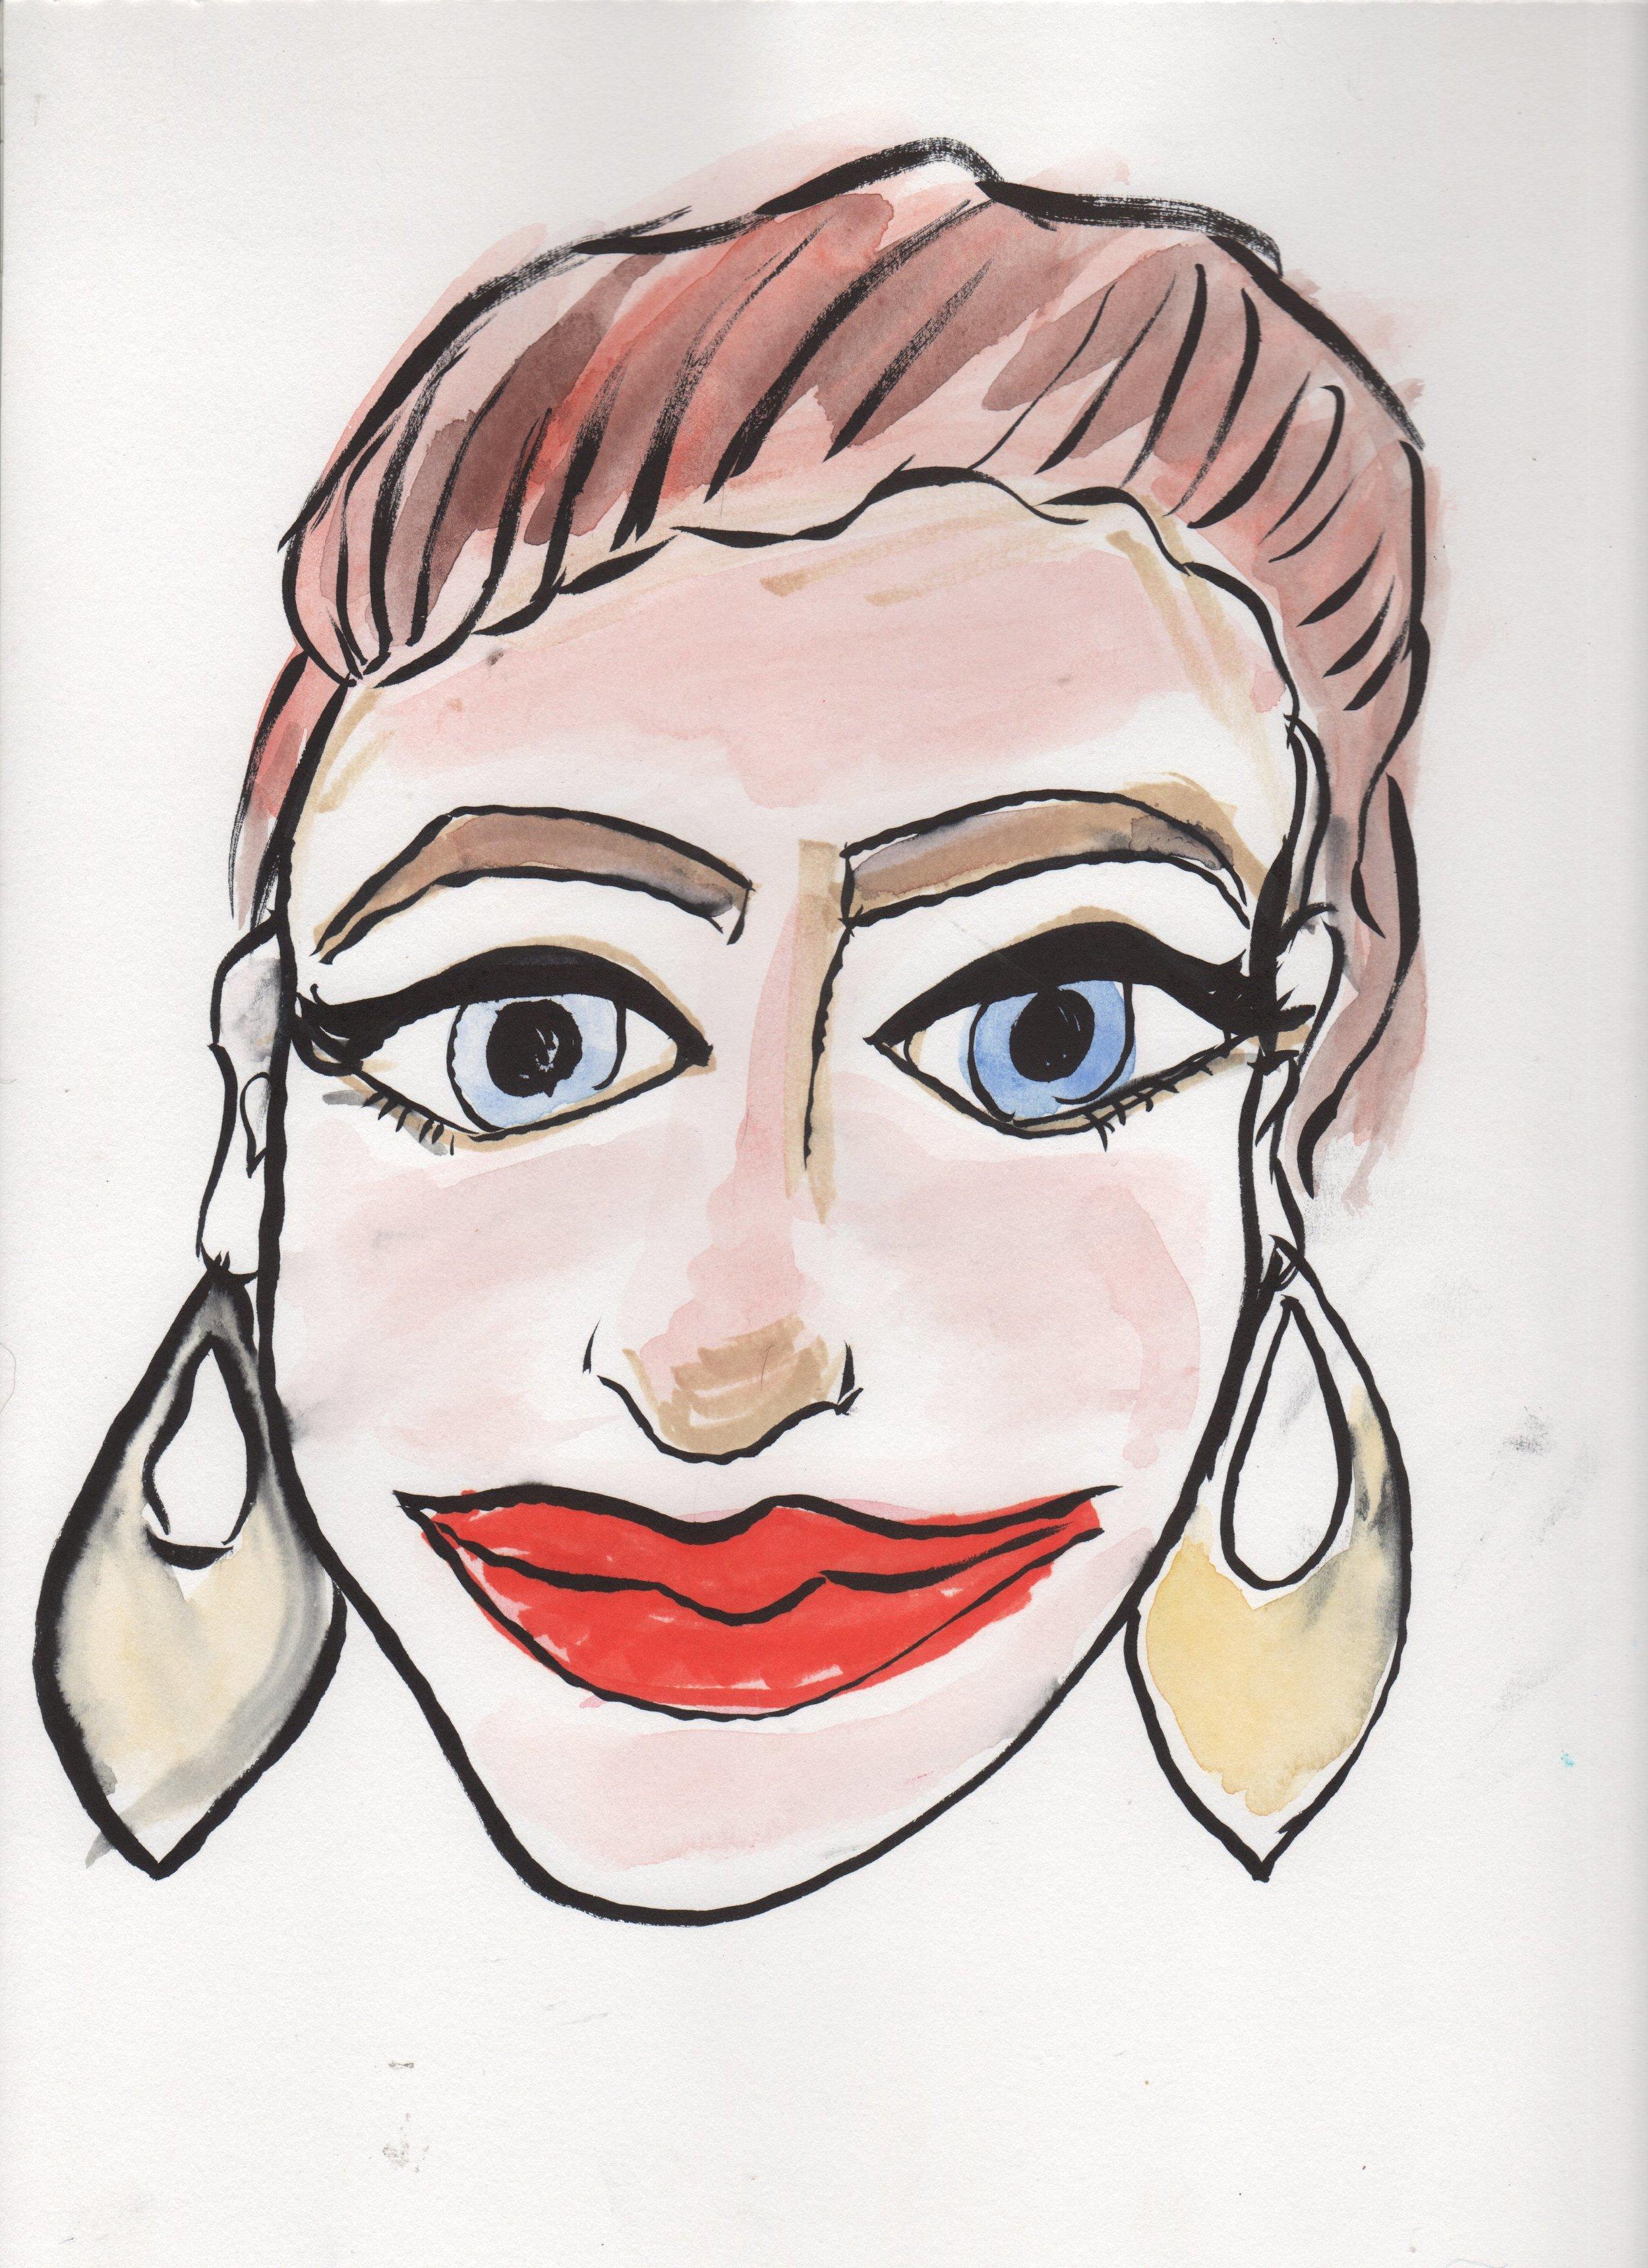 caricature002.jpg